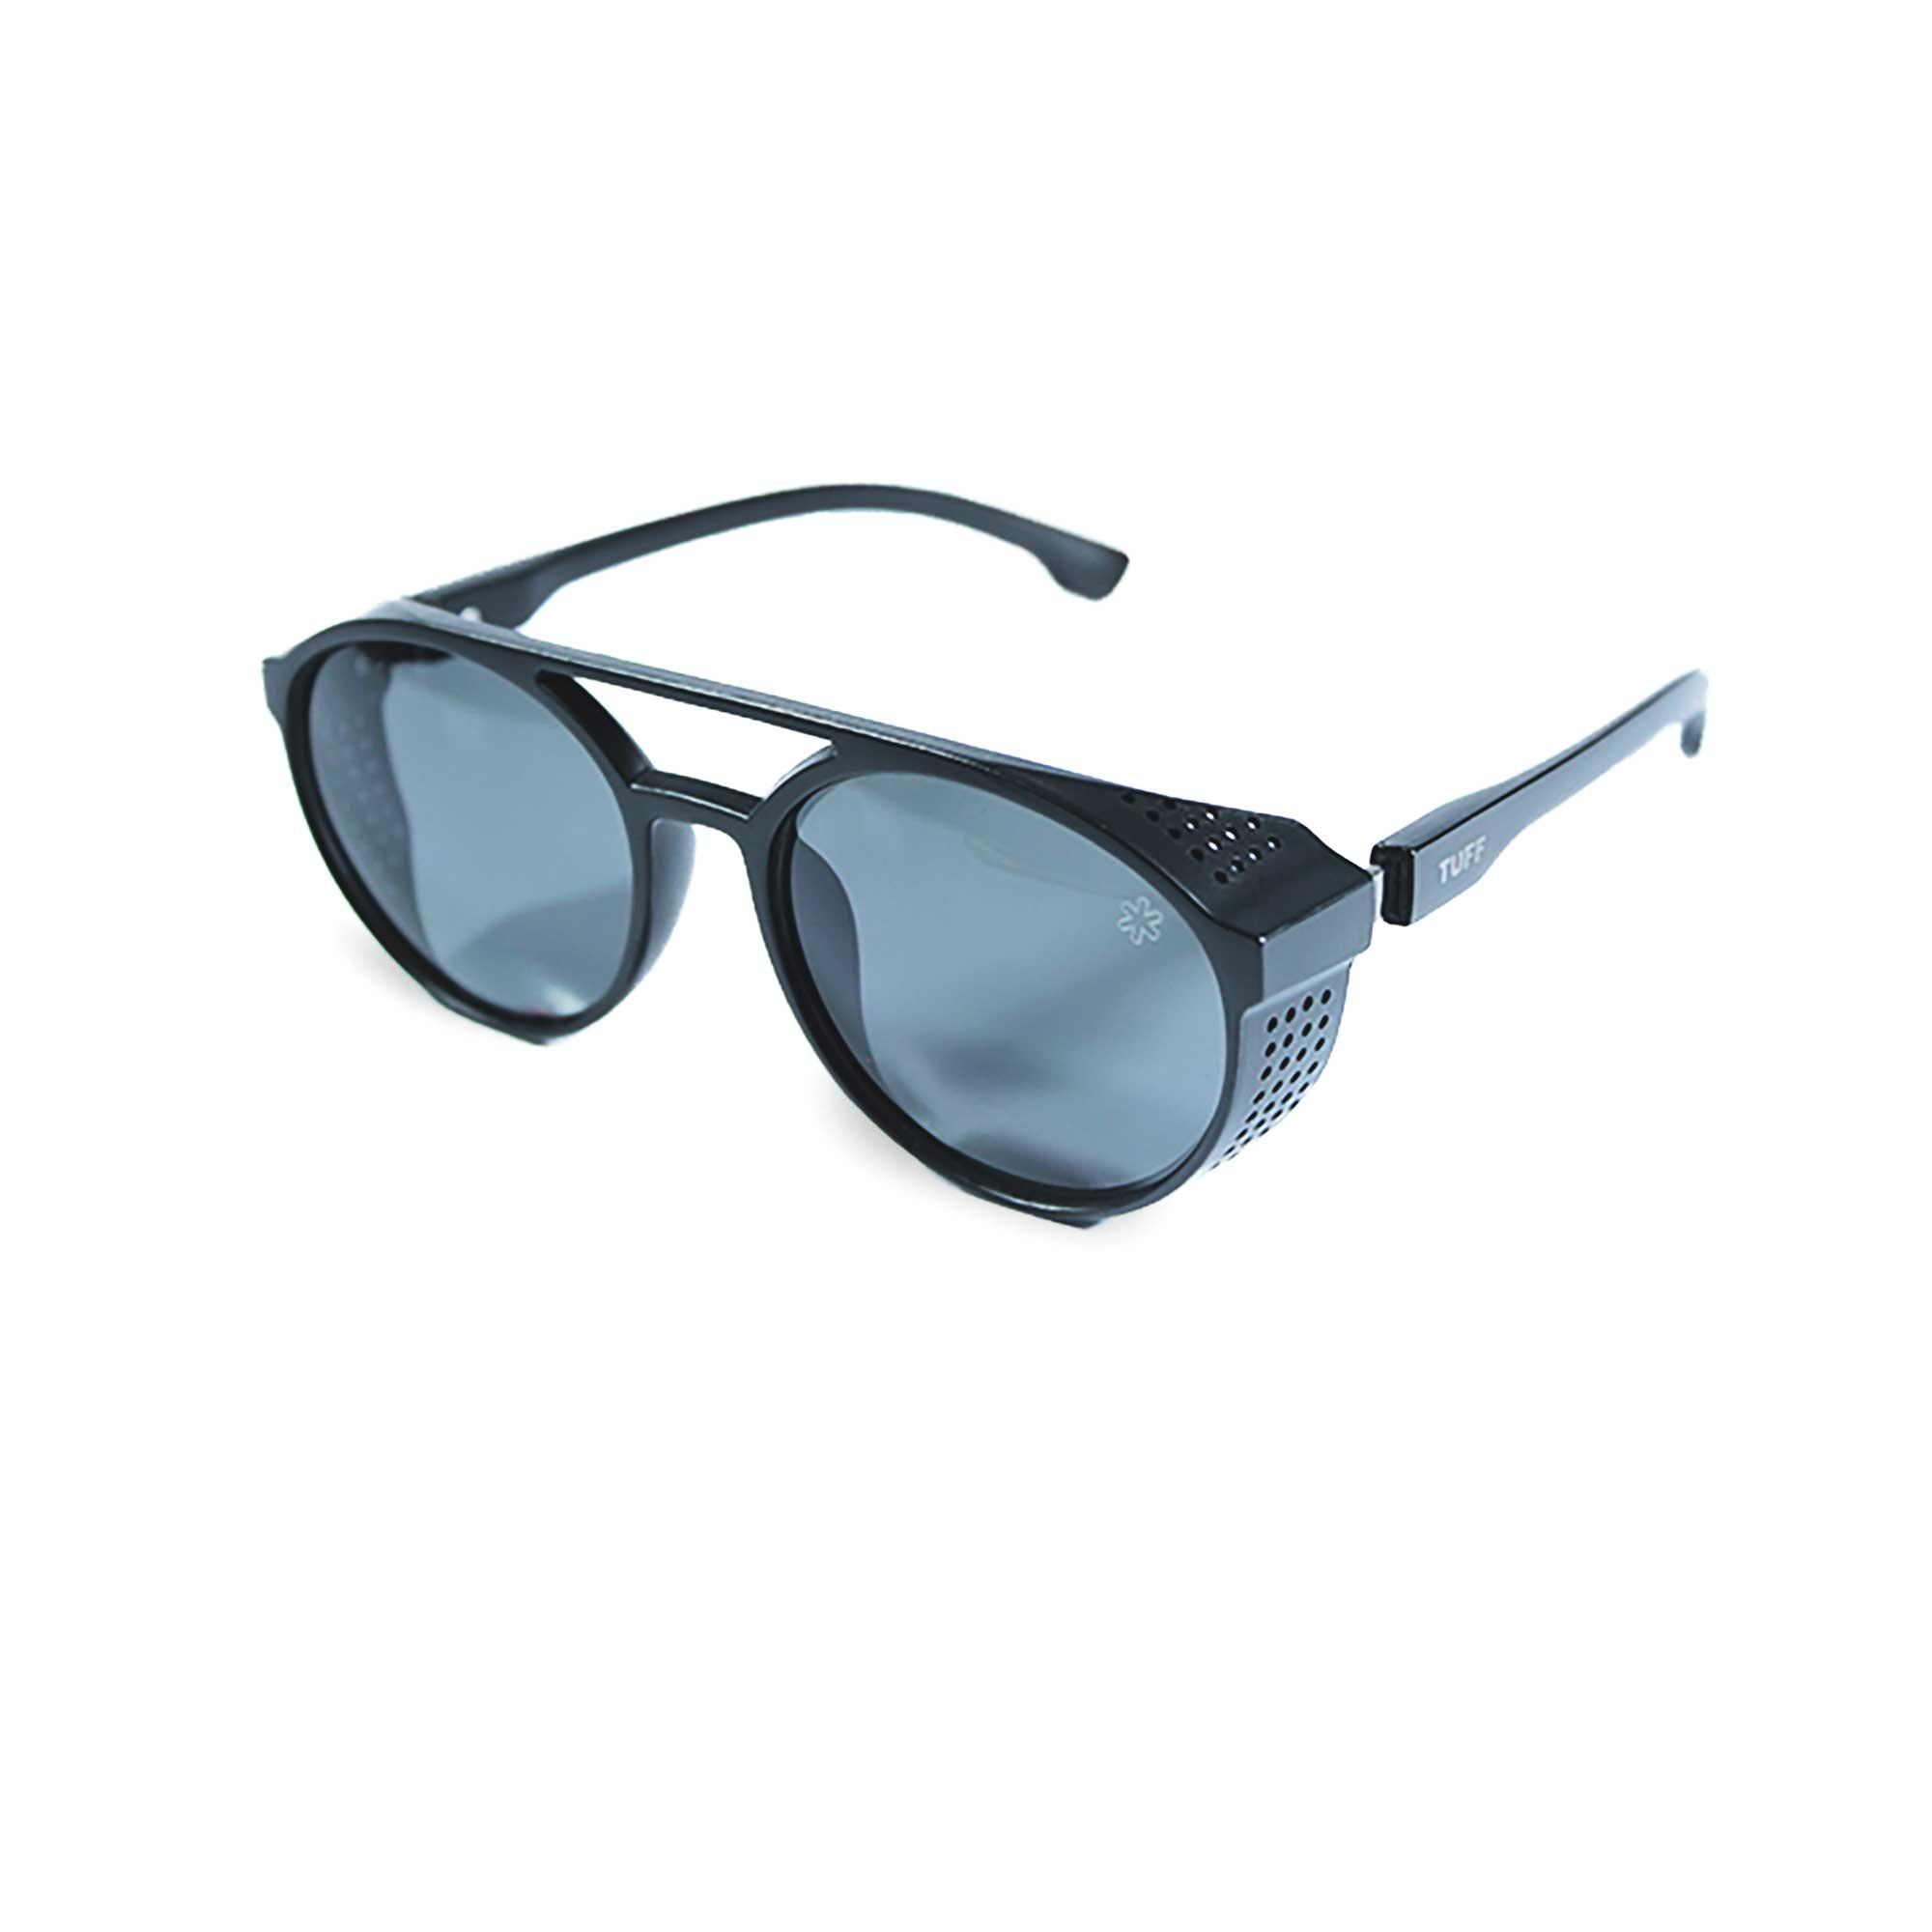 Sunglasses Alok Preto Fosco